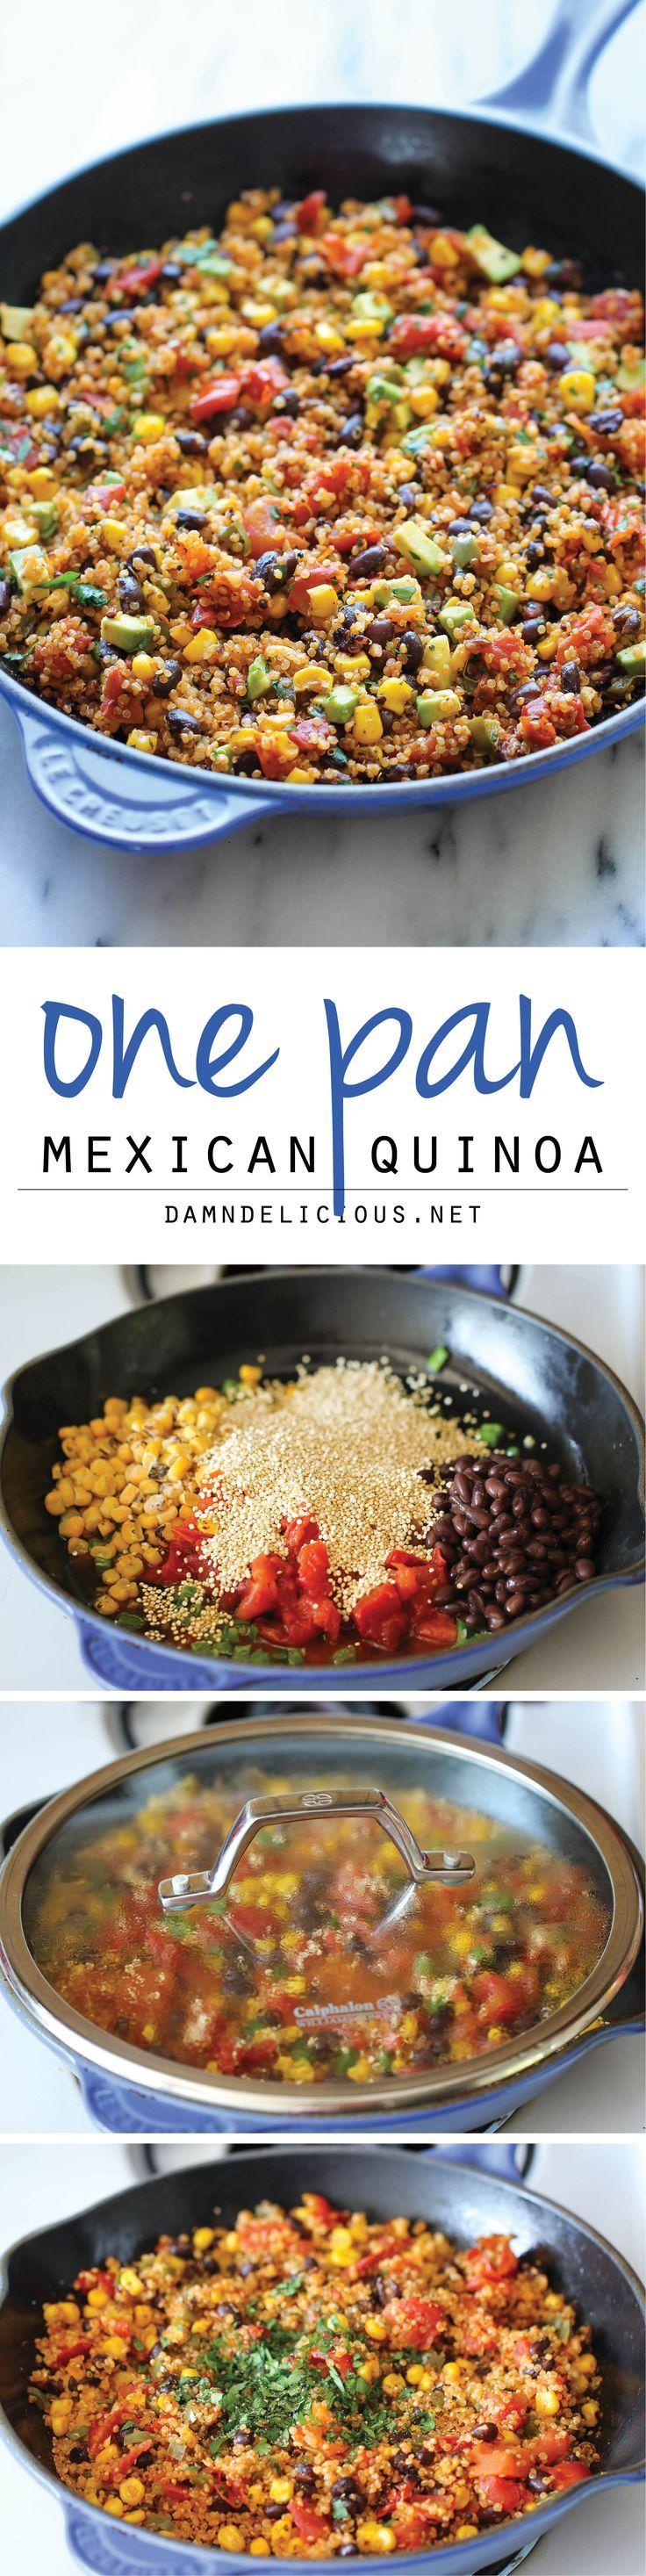 One Pan Vegan Mexican Quinoa Recipe